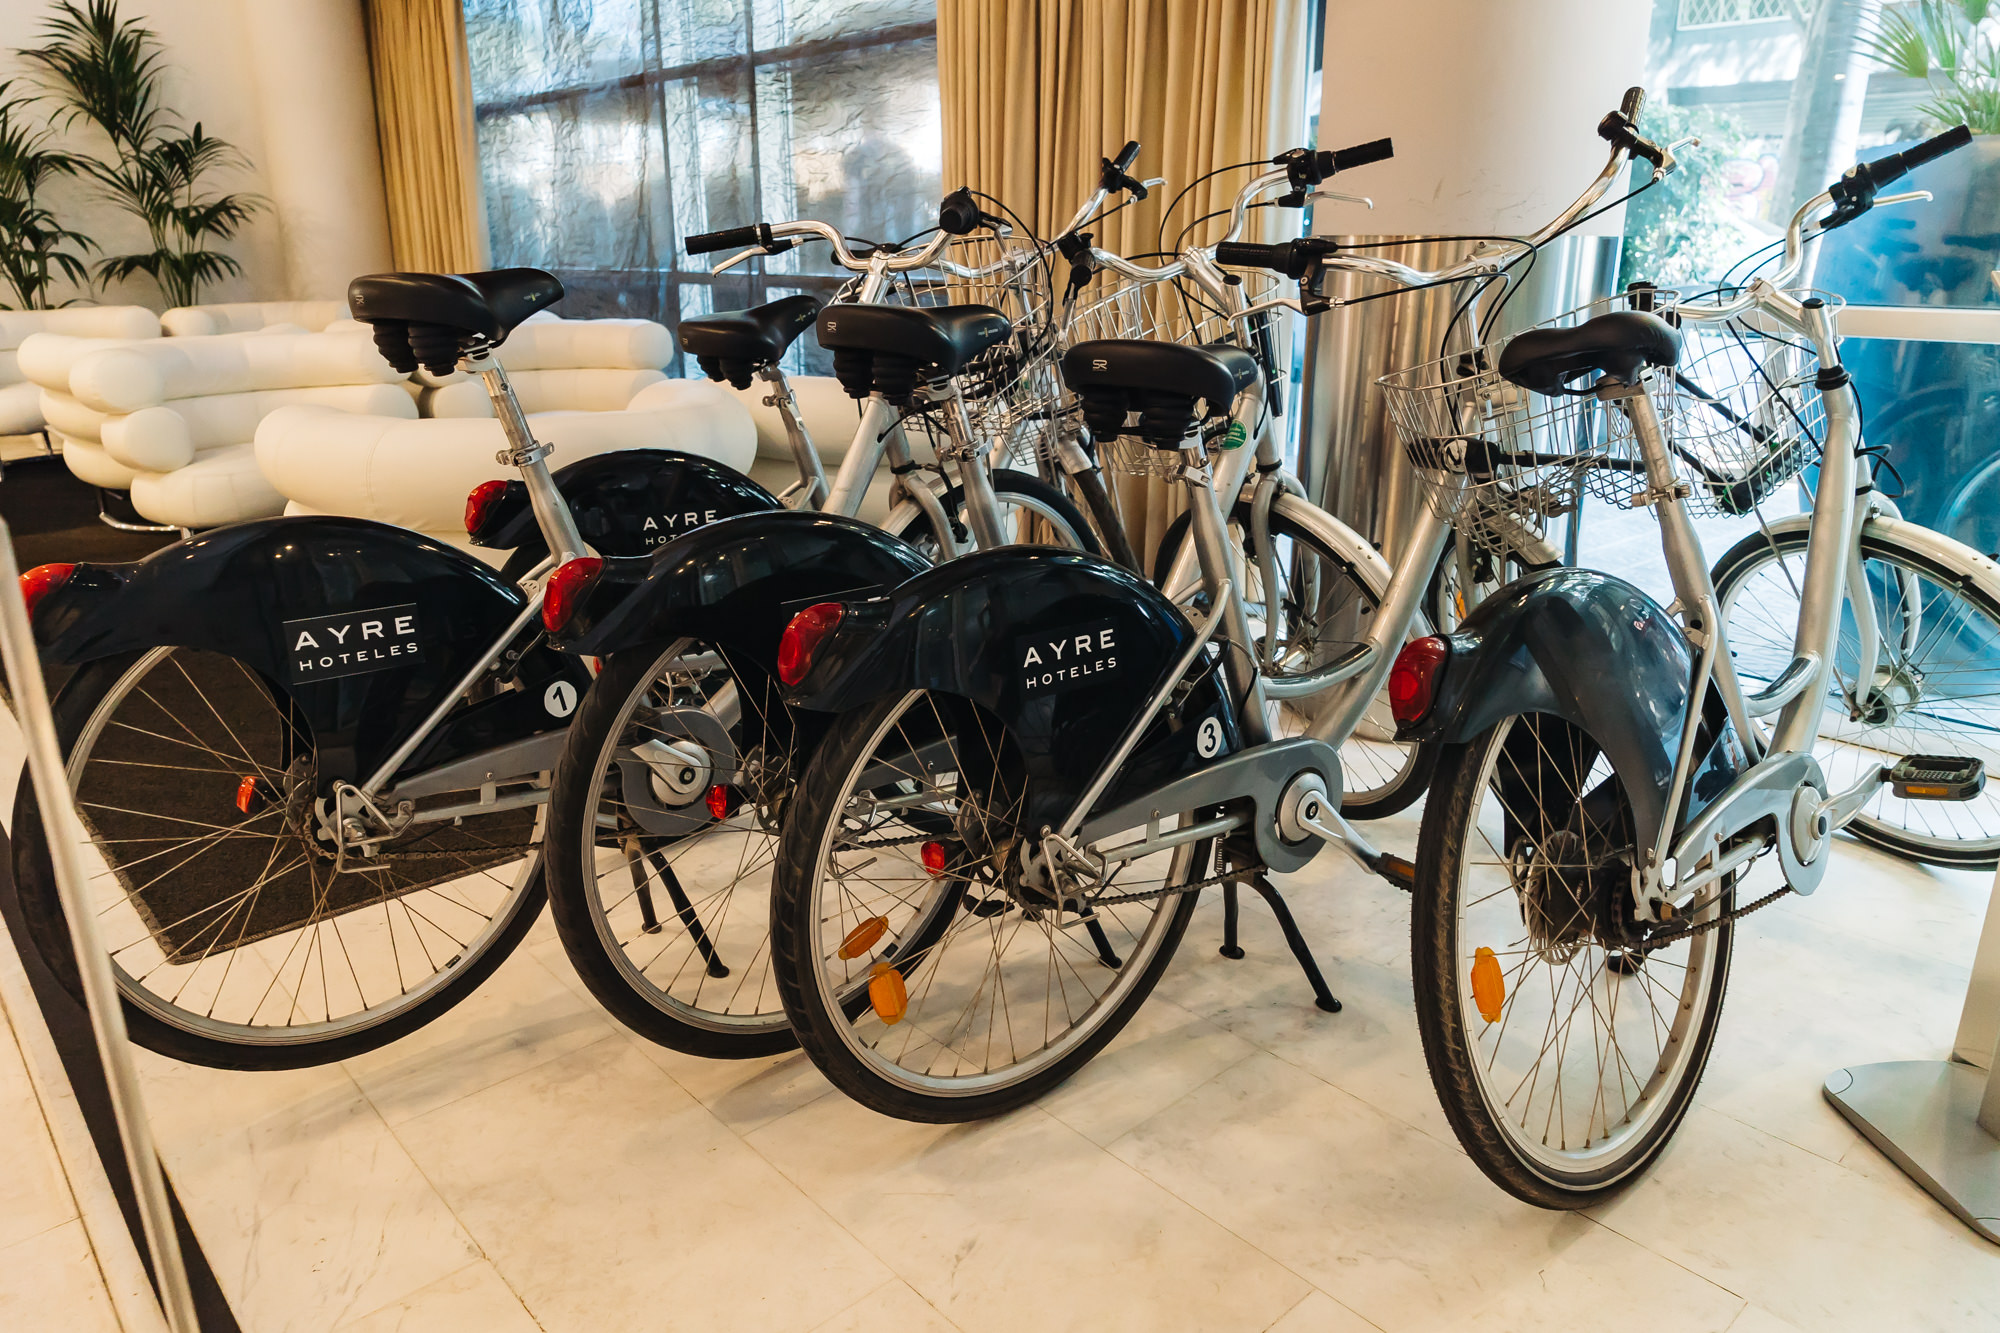 Ayre Hotel Caspe bike rental